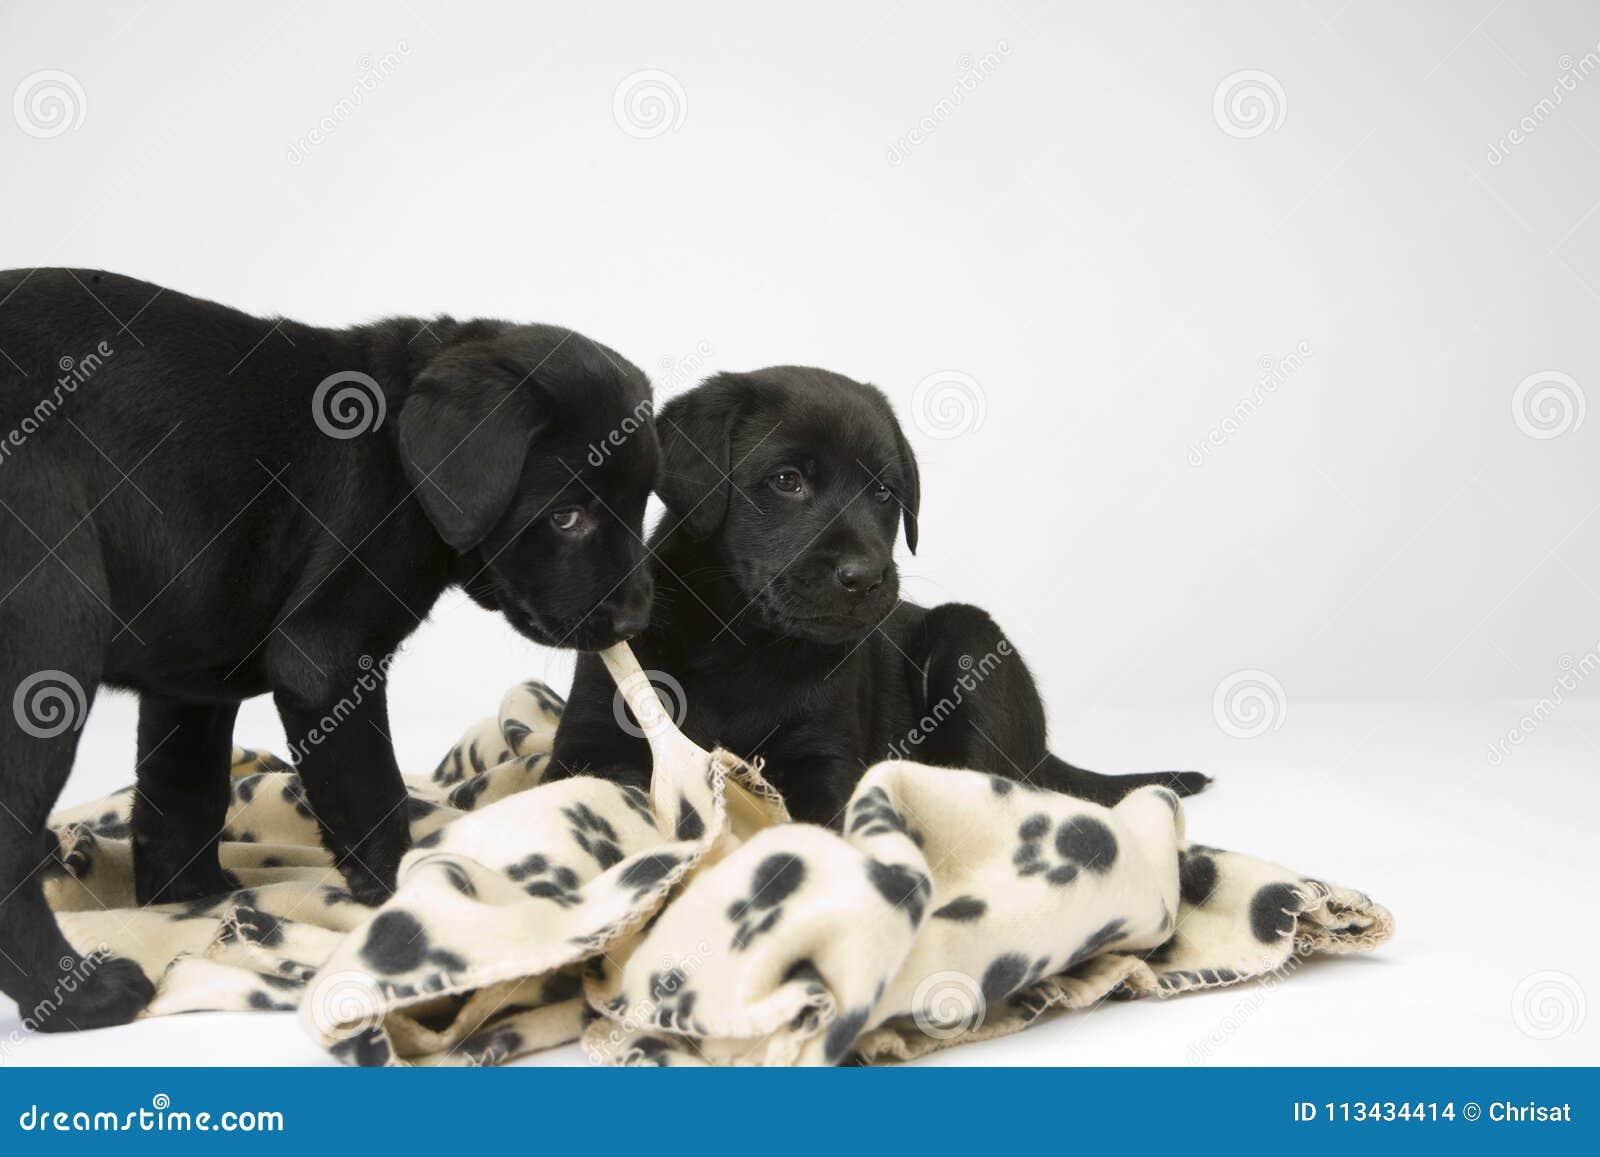 Black Lab Puppies On White Seamless Stock Photo Image Of Seamless Kw0p 113434414